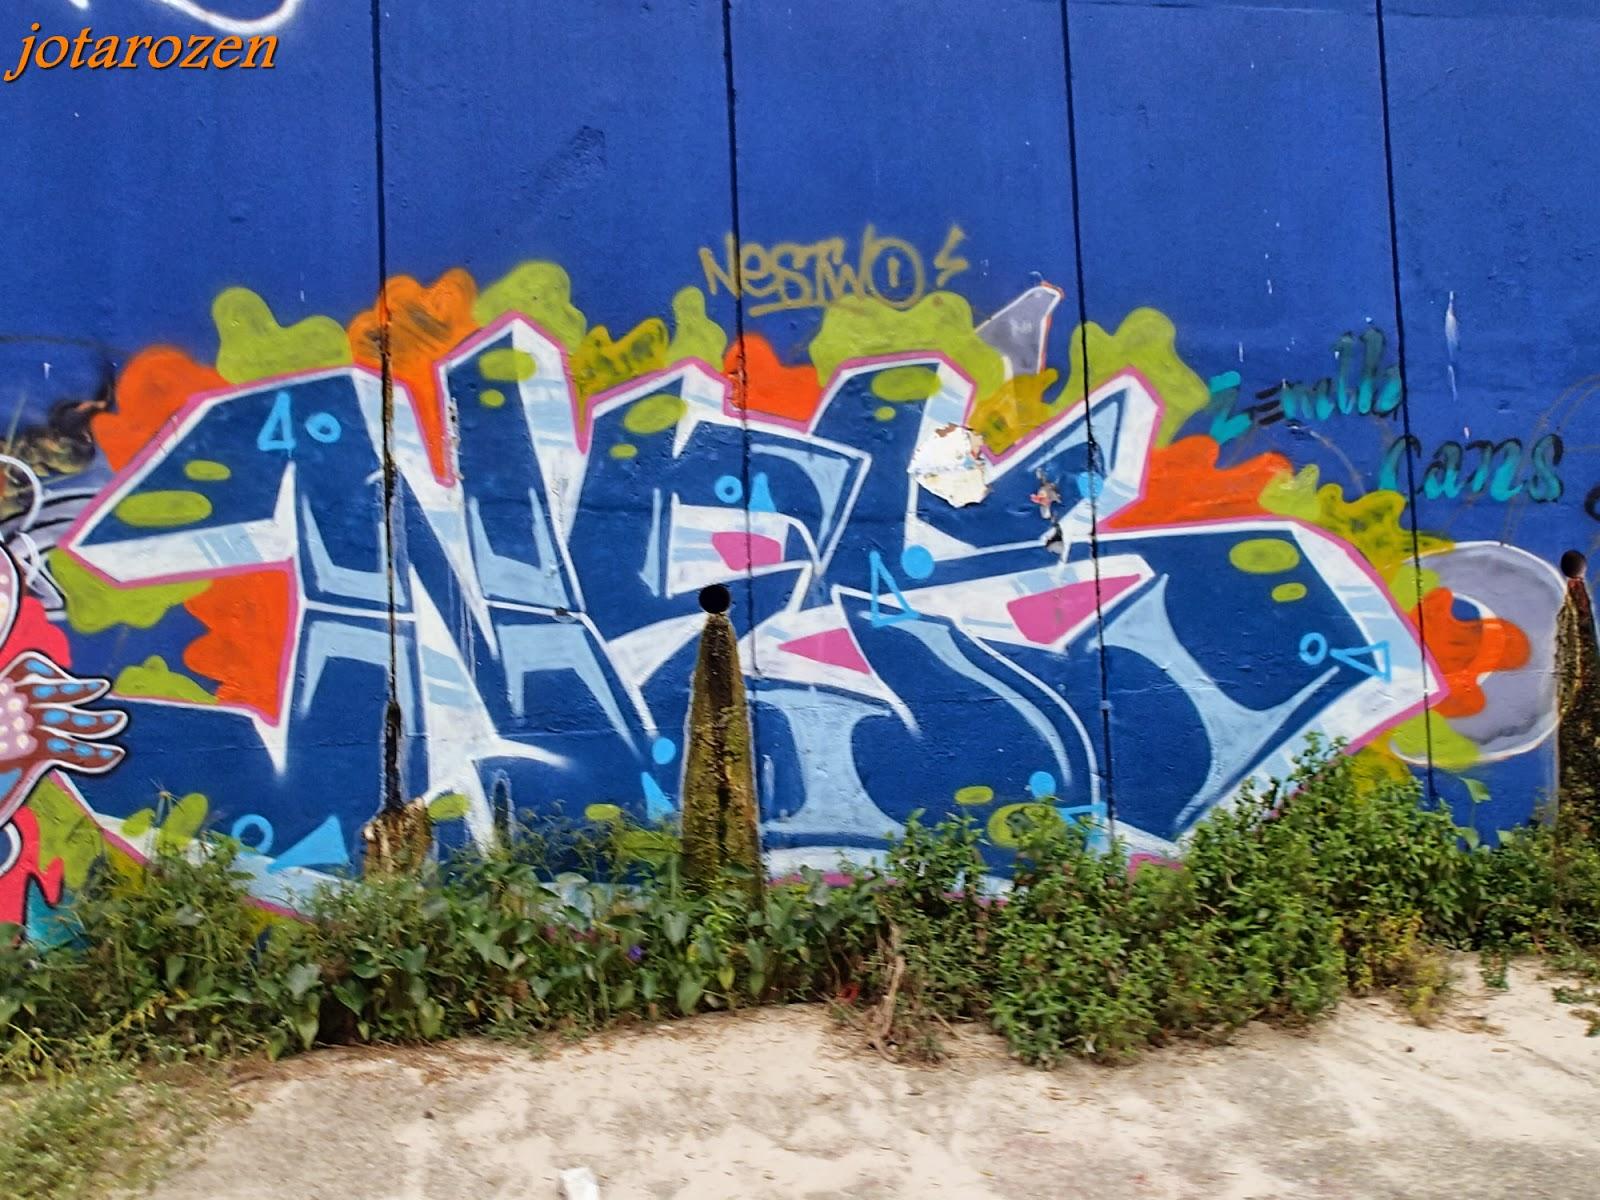 Footsteps jotaro 39 s travels photo gallery graffiti for Mural 1 malaysia negaraku